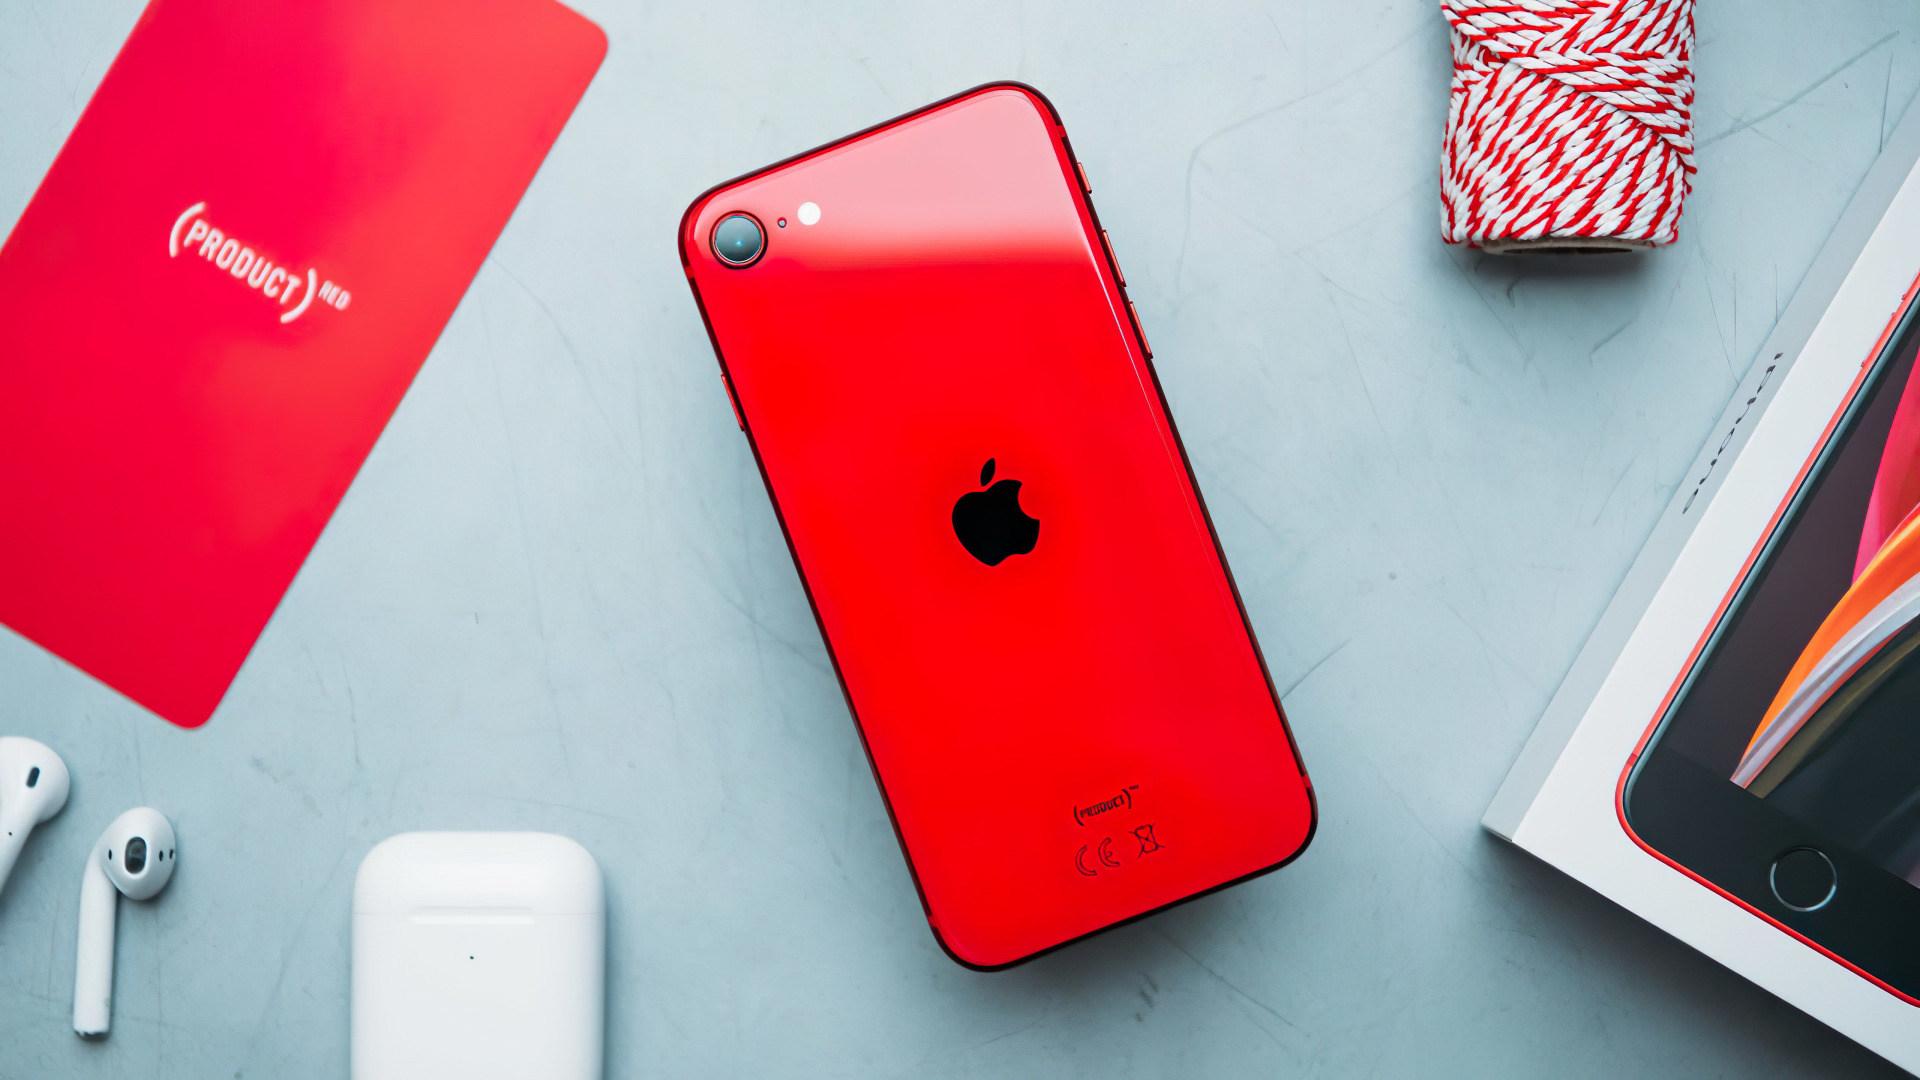 Smartphone, Apple, Iphone, Test, iPhone SE, Apple iPhone SE, Jonas Kaniuth, TechnikFreundYT, iPhone SE 2020, Apple iPhone SE 2020